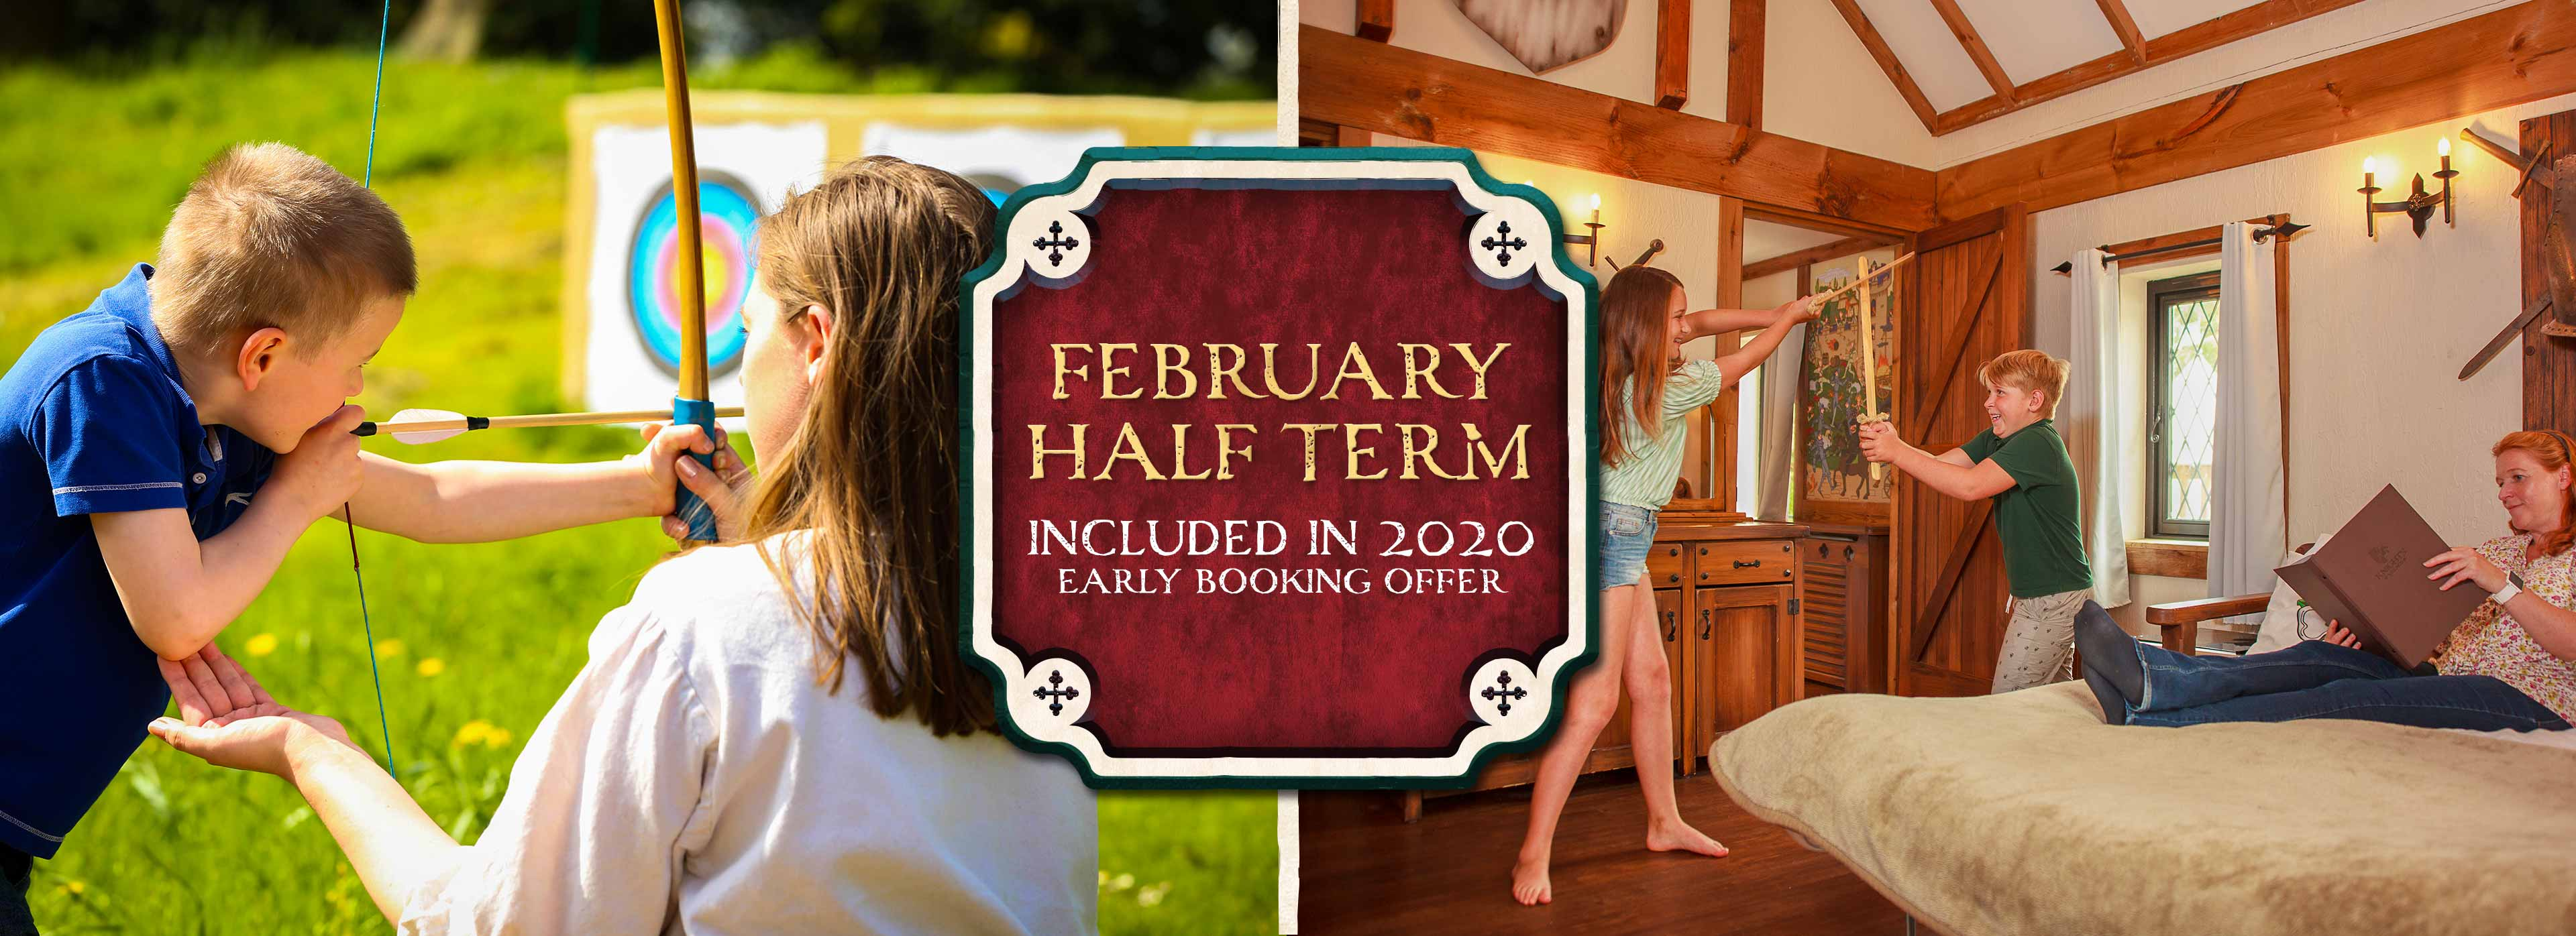 February Half Term 2020 at Warwick Castle